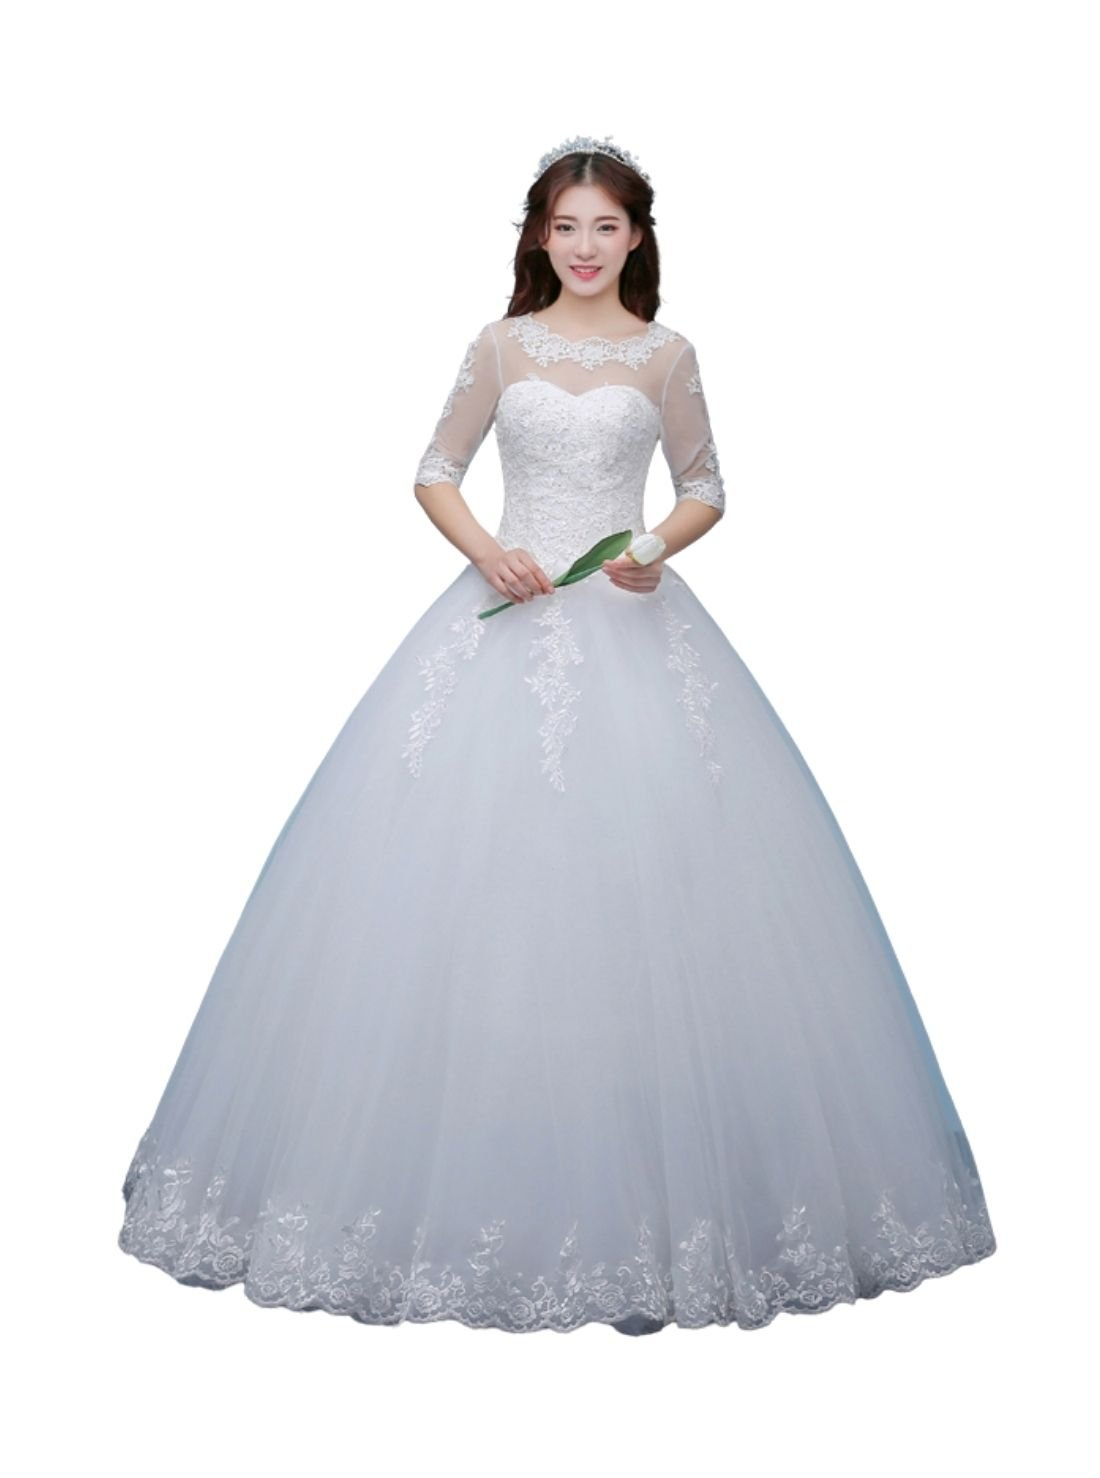 Wedding Dress White Ball Gown China